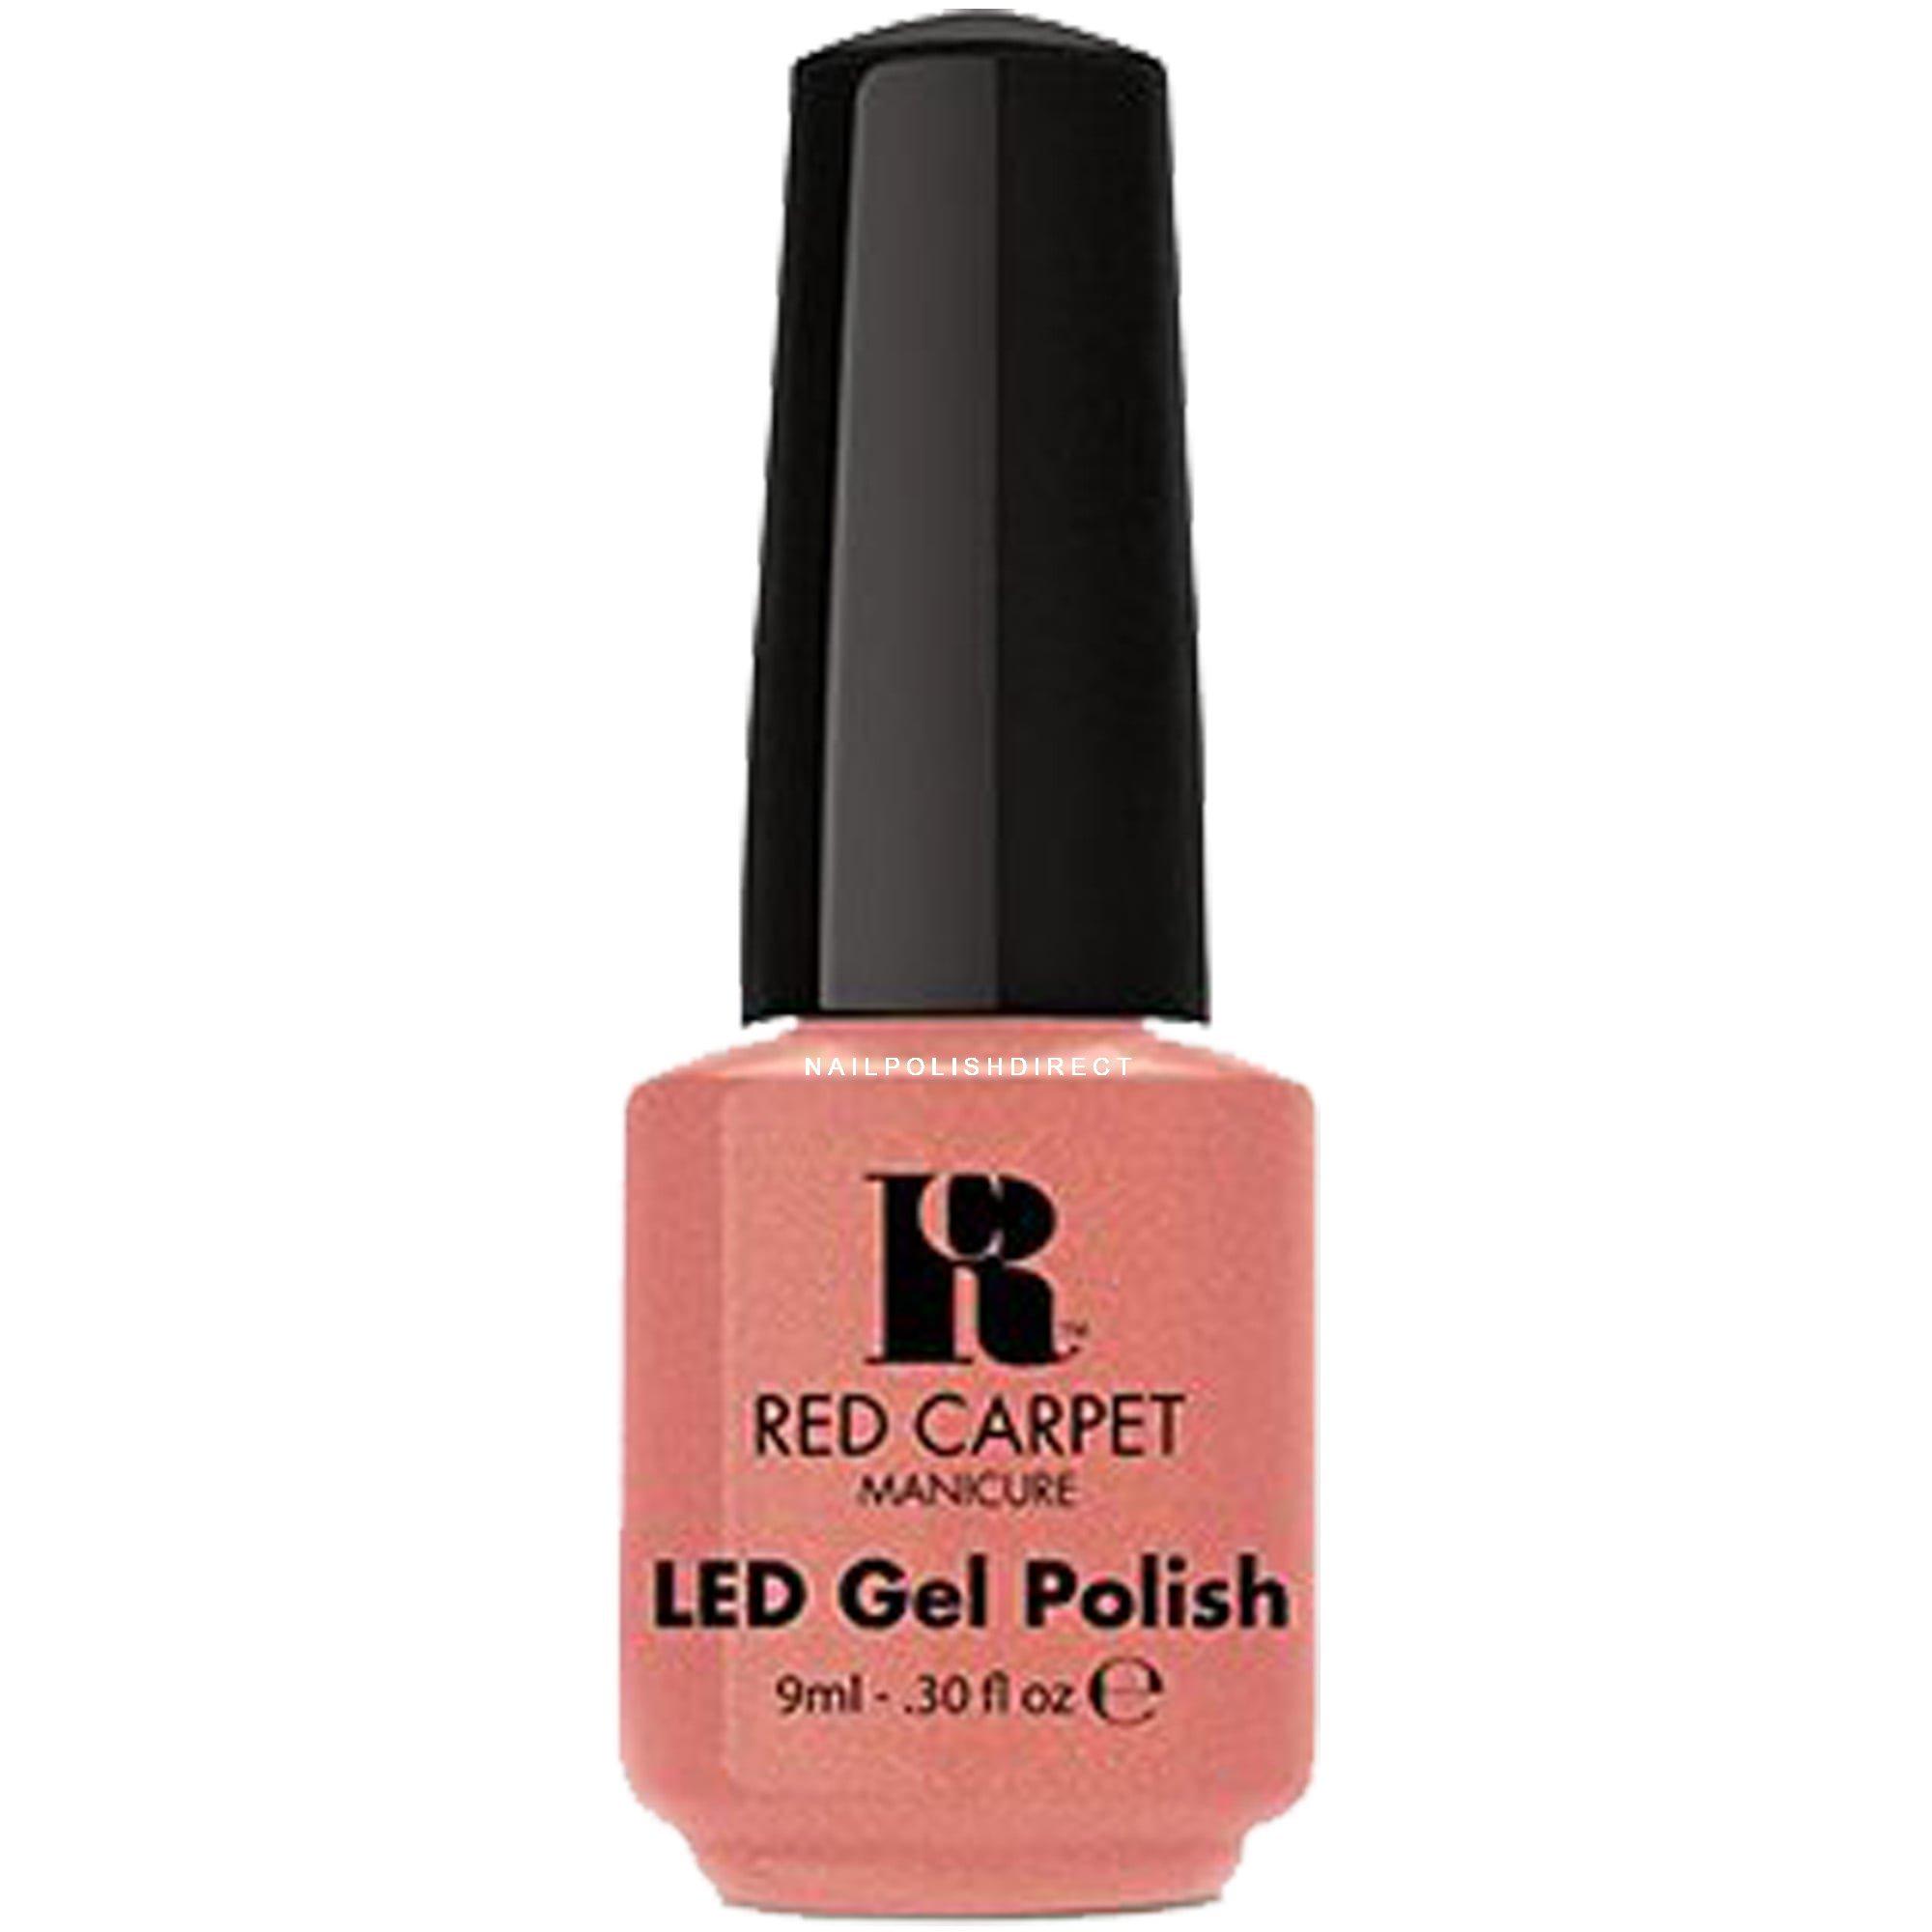 Red Carpet LED Gel Nail Polish - A Dream Come True 9ml | Professional